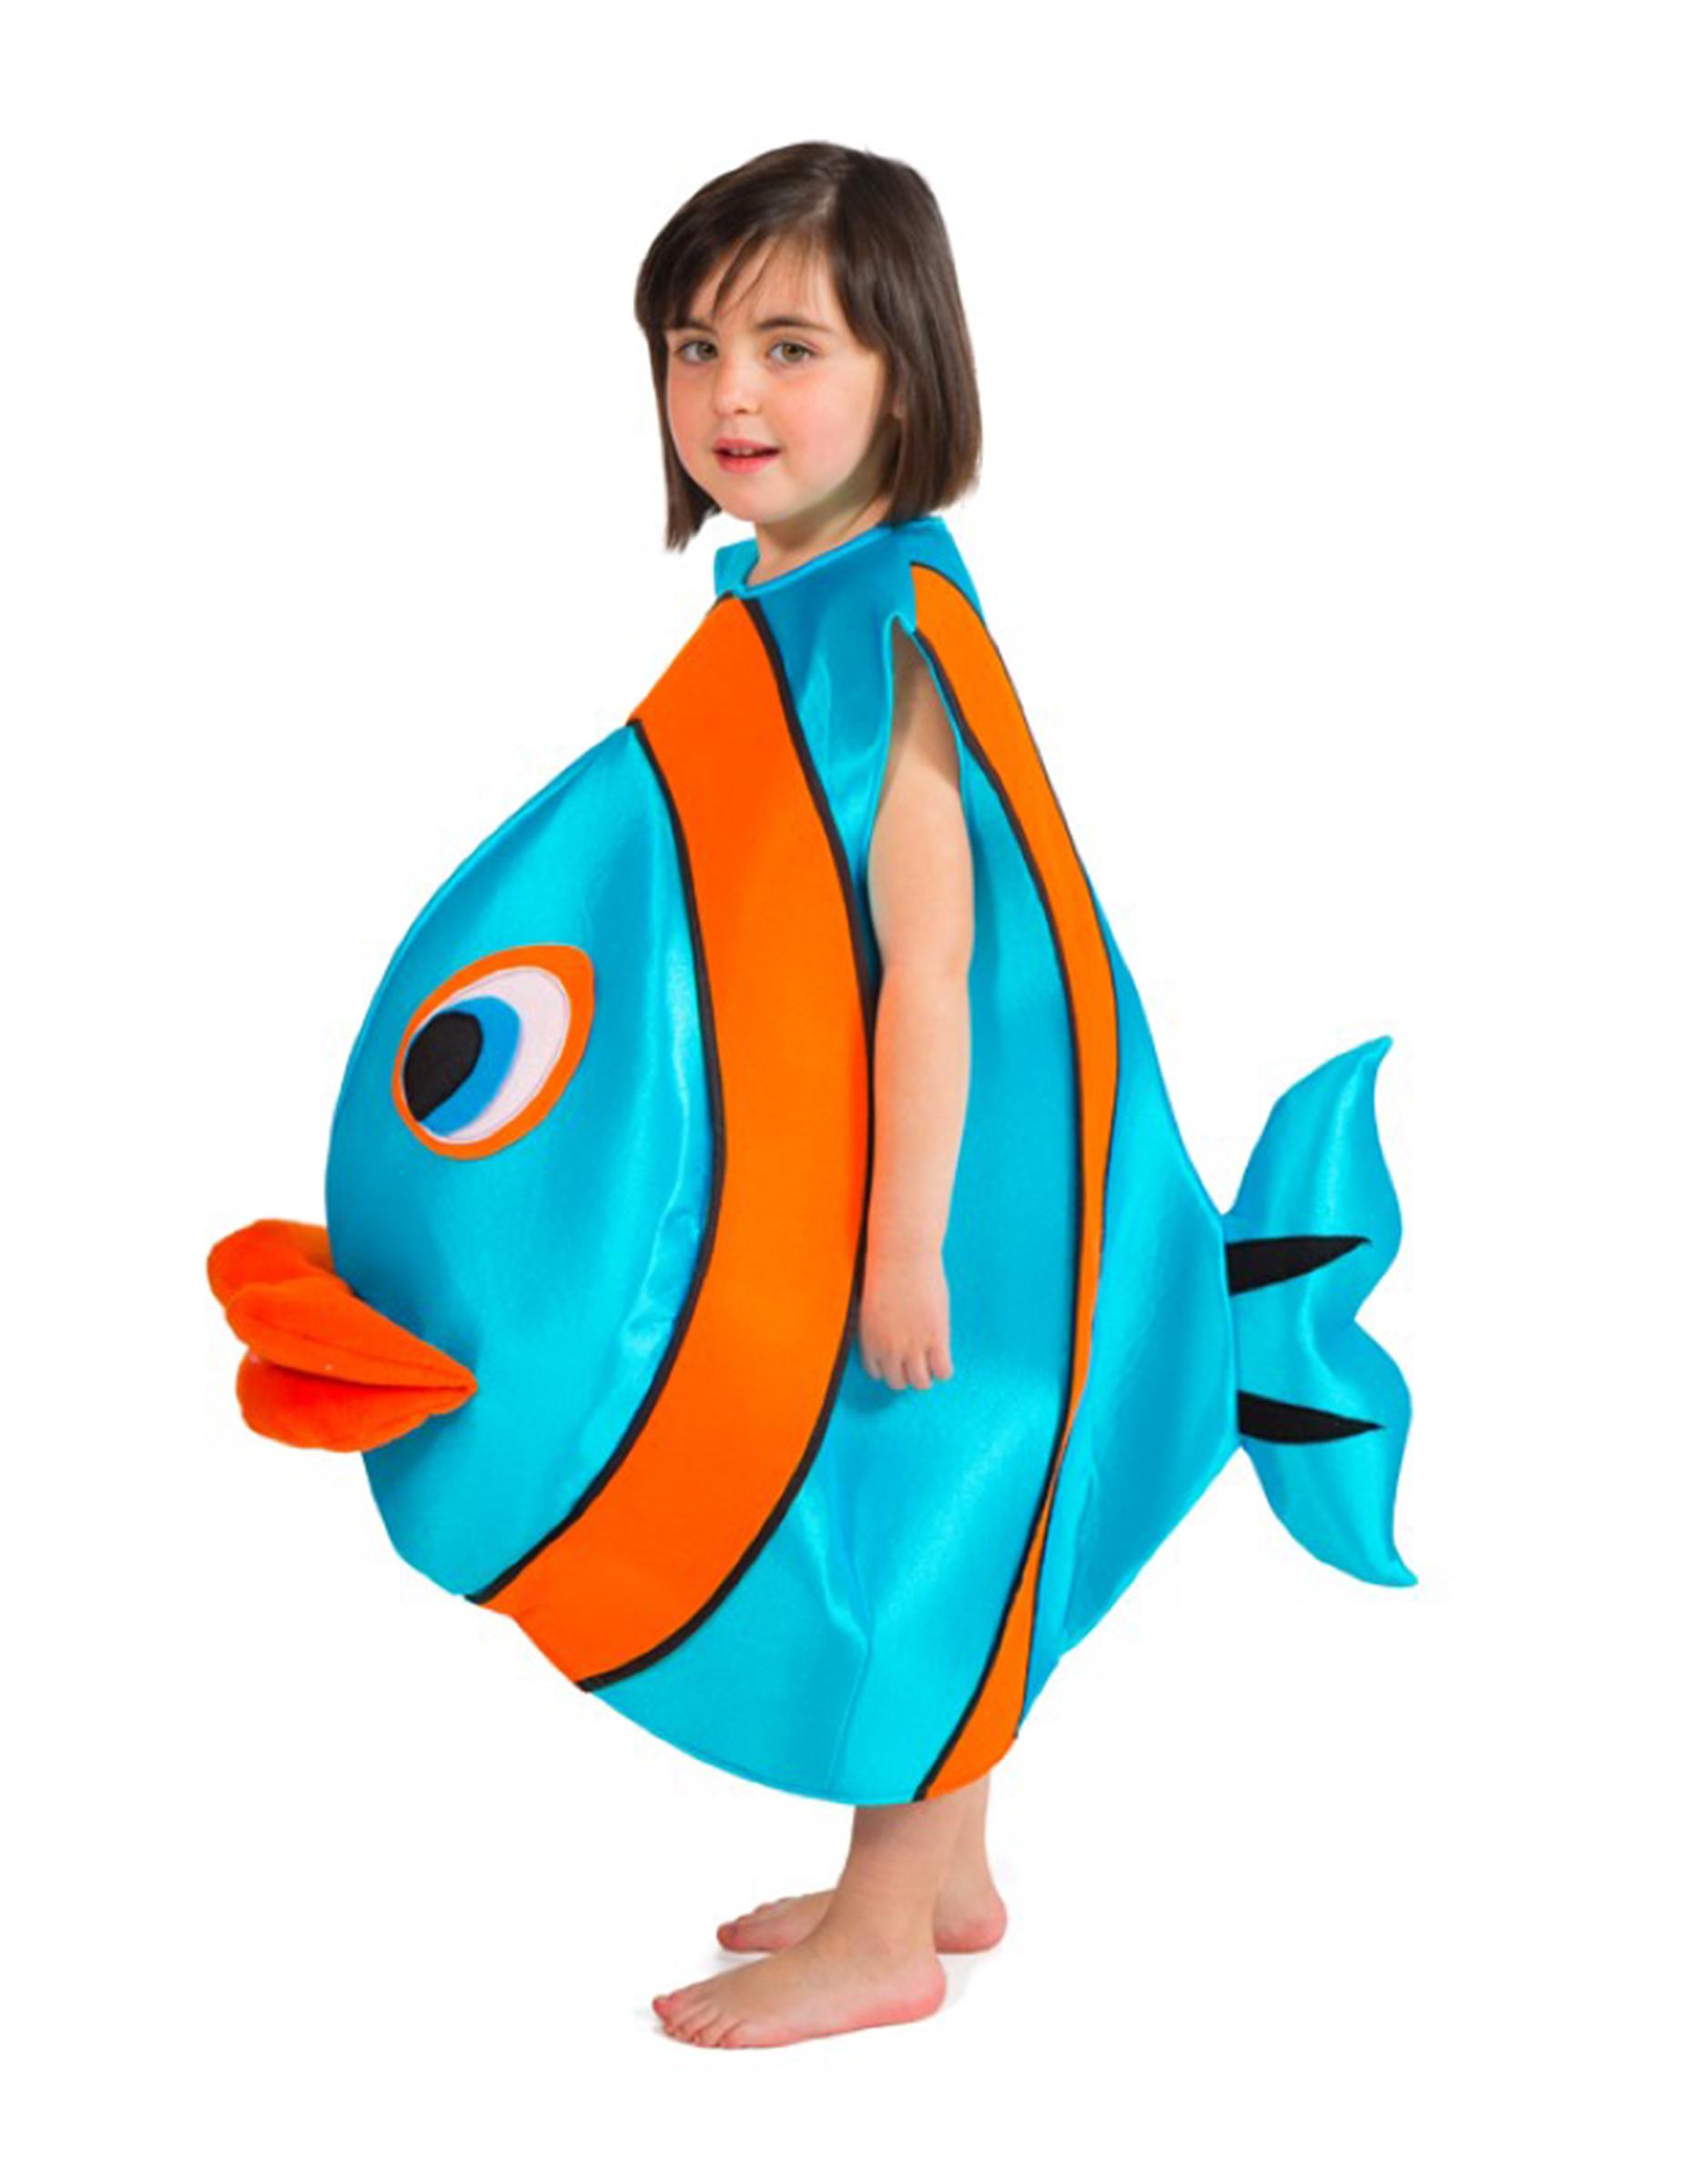 Lustiges Fisch Kostum Fur Kinder Blau Orange Gunstige Faschings